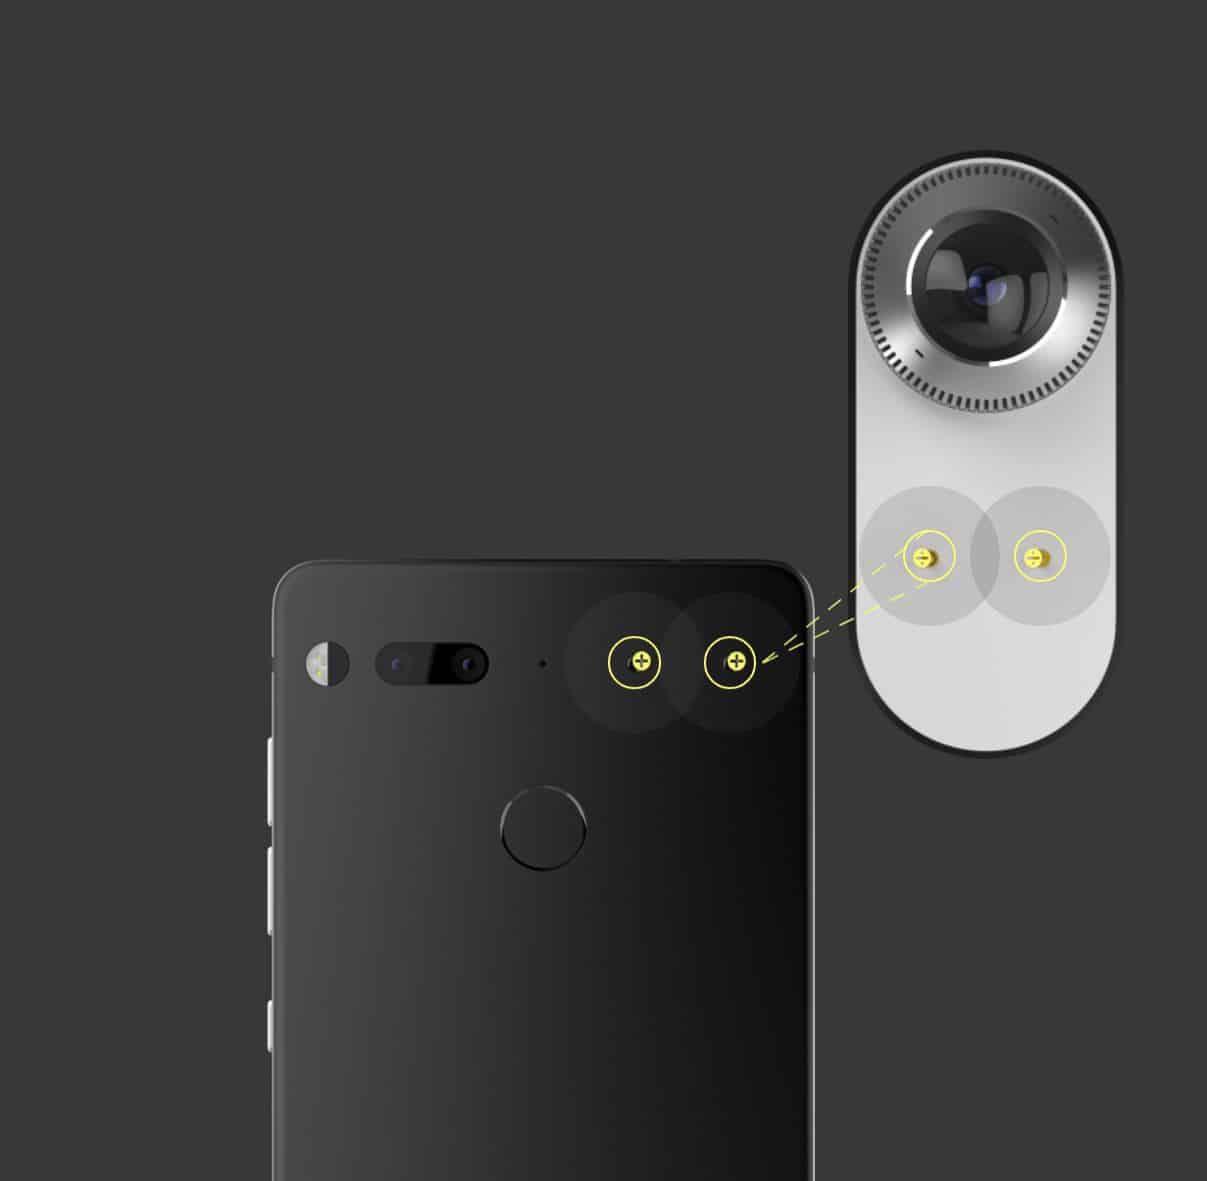 Essentail phone camera